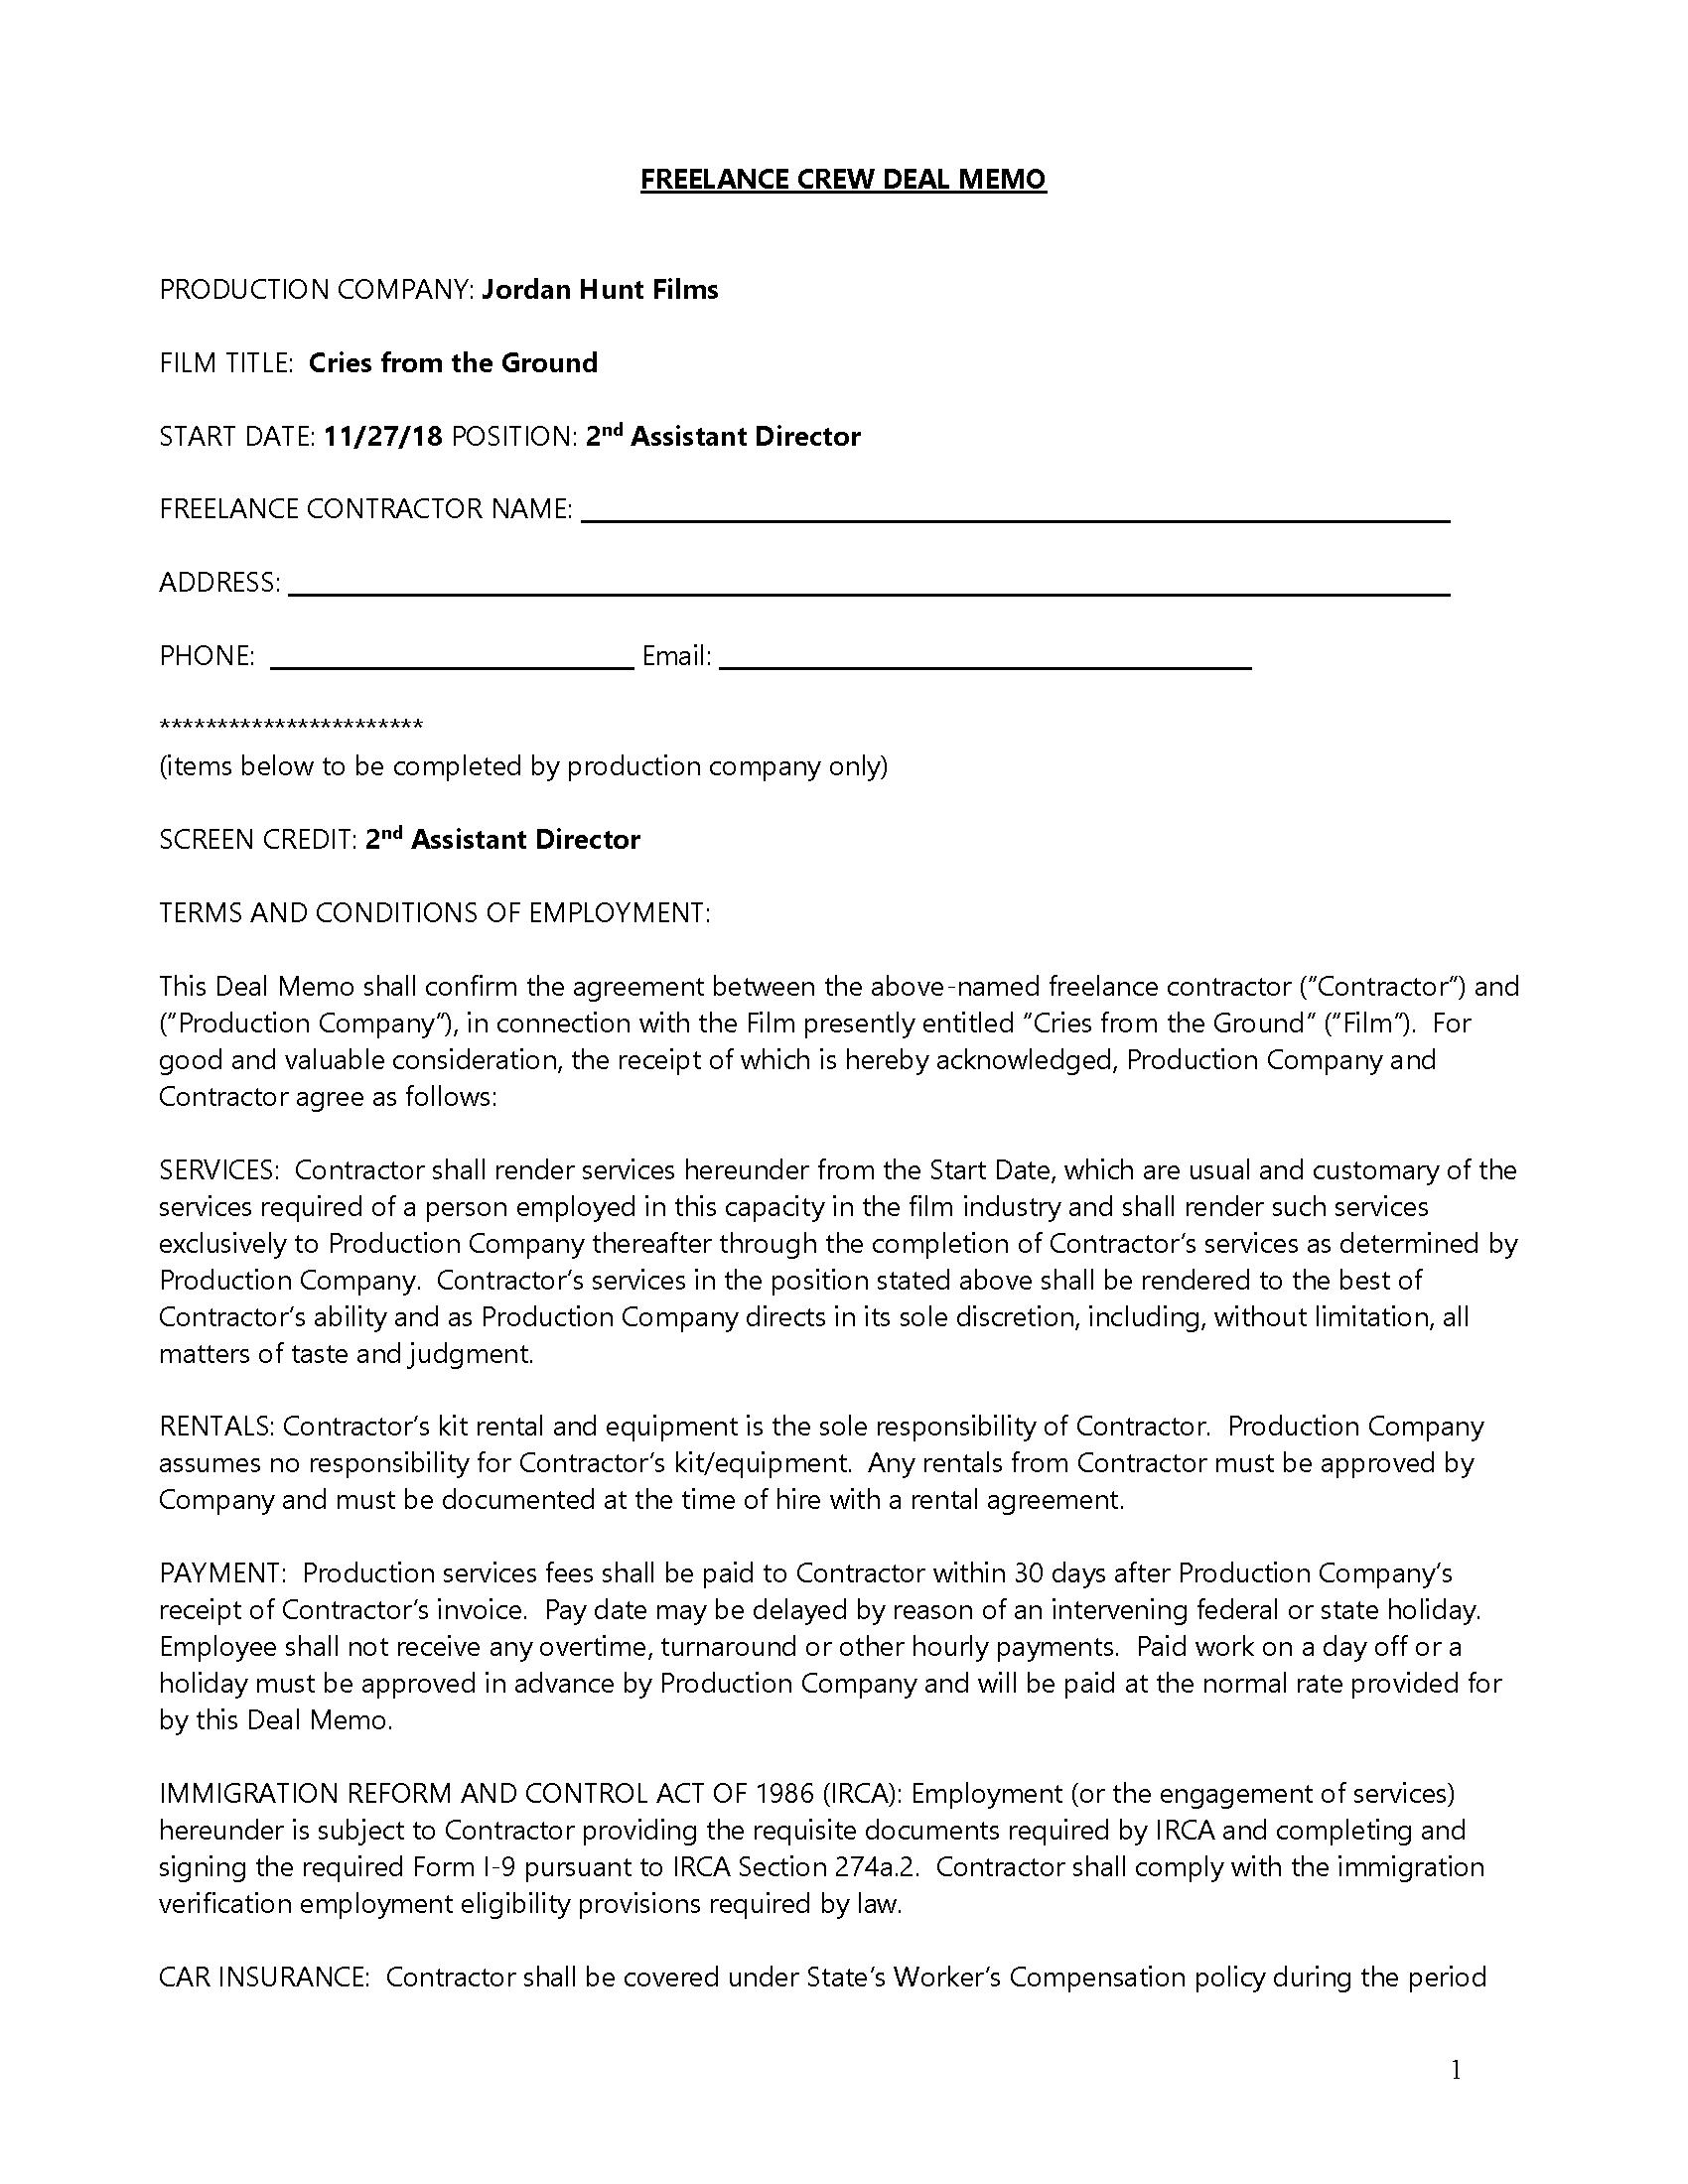 Crew Deal Memo